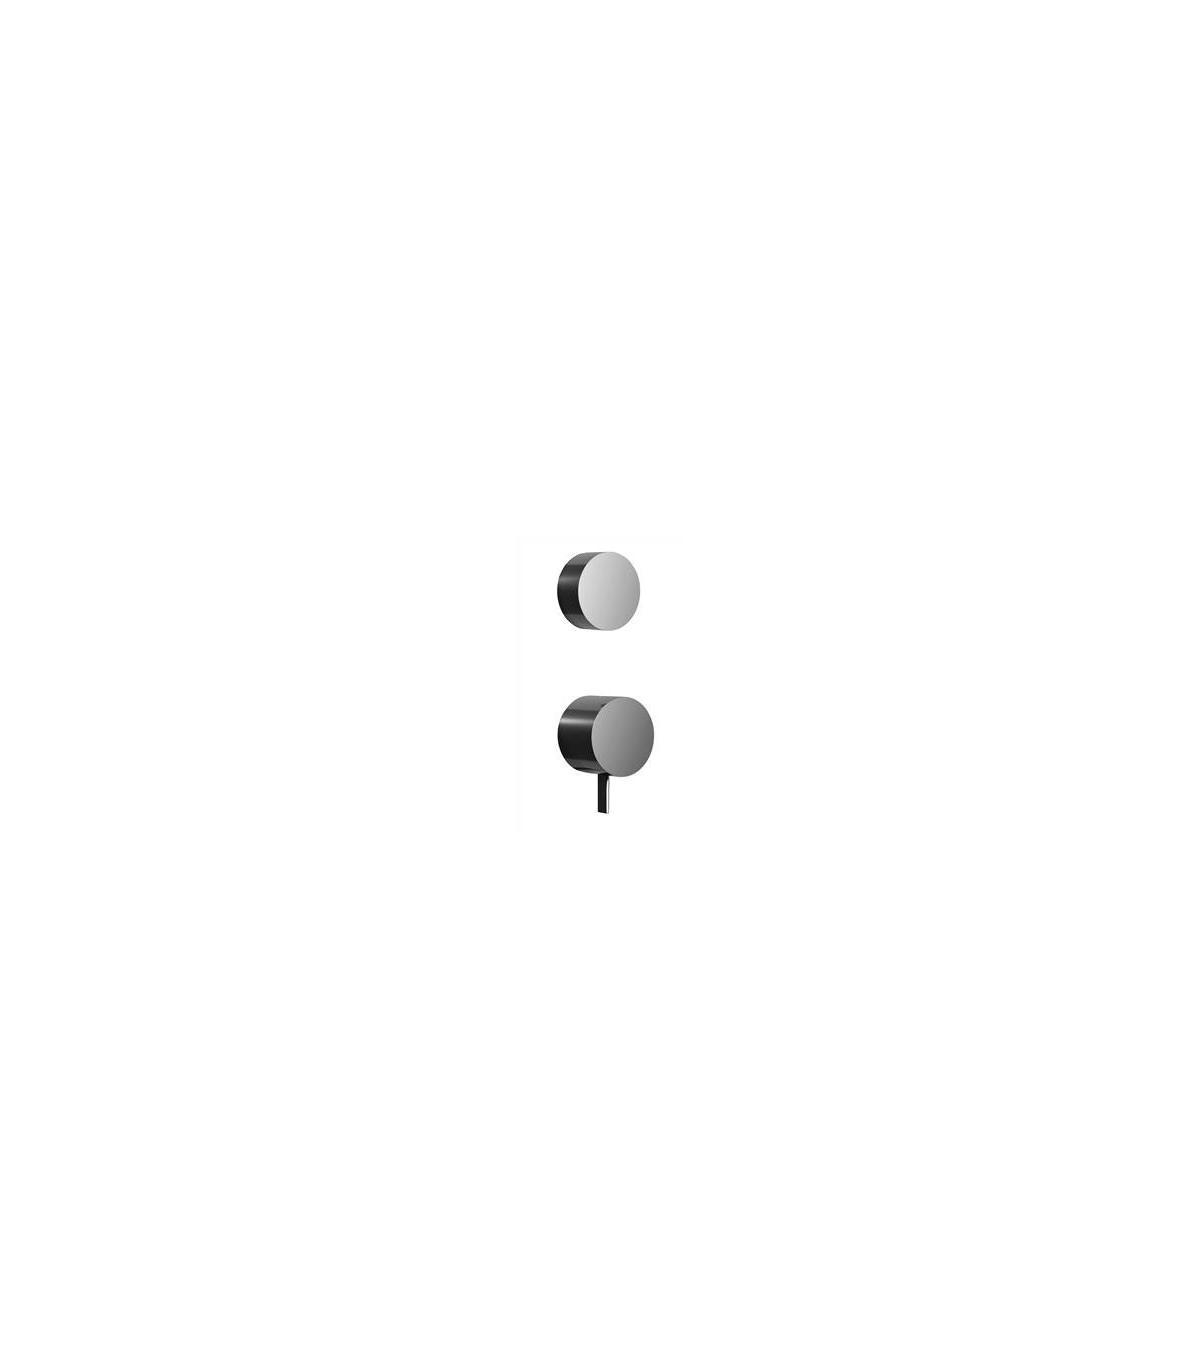 Flaminia art Trcw02 bianco. serie terra sedile normale